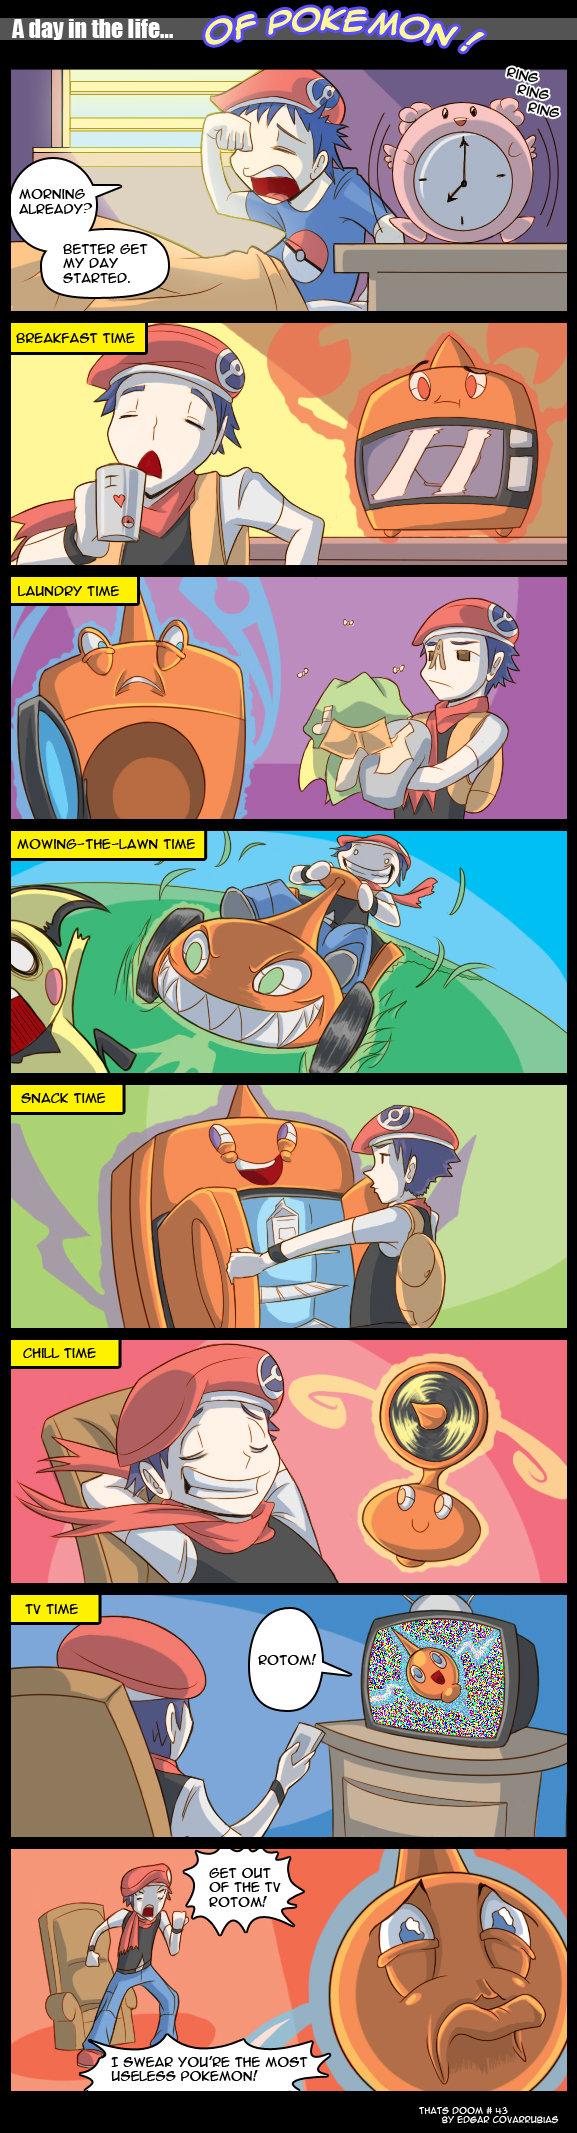 Usless Rotom. . ii' ! lrlrl MY any. Rotom is boss. Rotom should not be treated like that. Hell, I treat my pokemon as well as I do my friends. Usless Rotom Pok